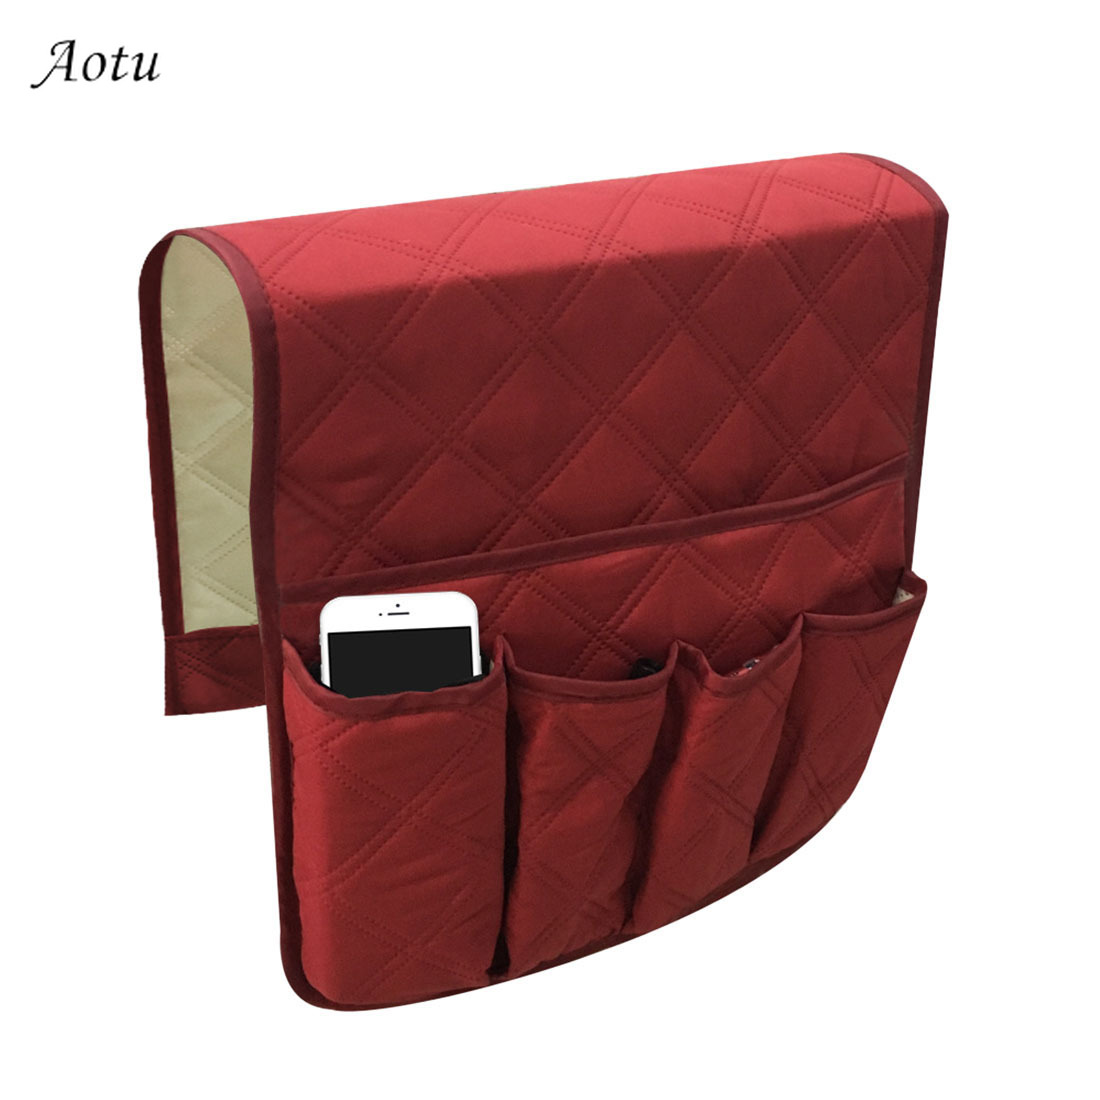 Sofa Storage Bag Use for Game Controller Pens ipad 5 Pocket Sofa Couch Arm Rest Organizer TV Remote Control Organizer Holder